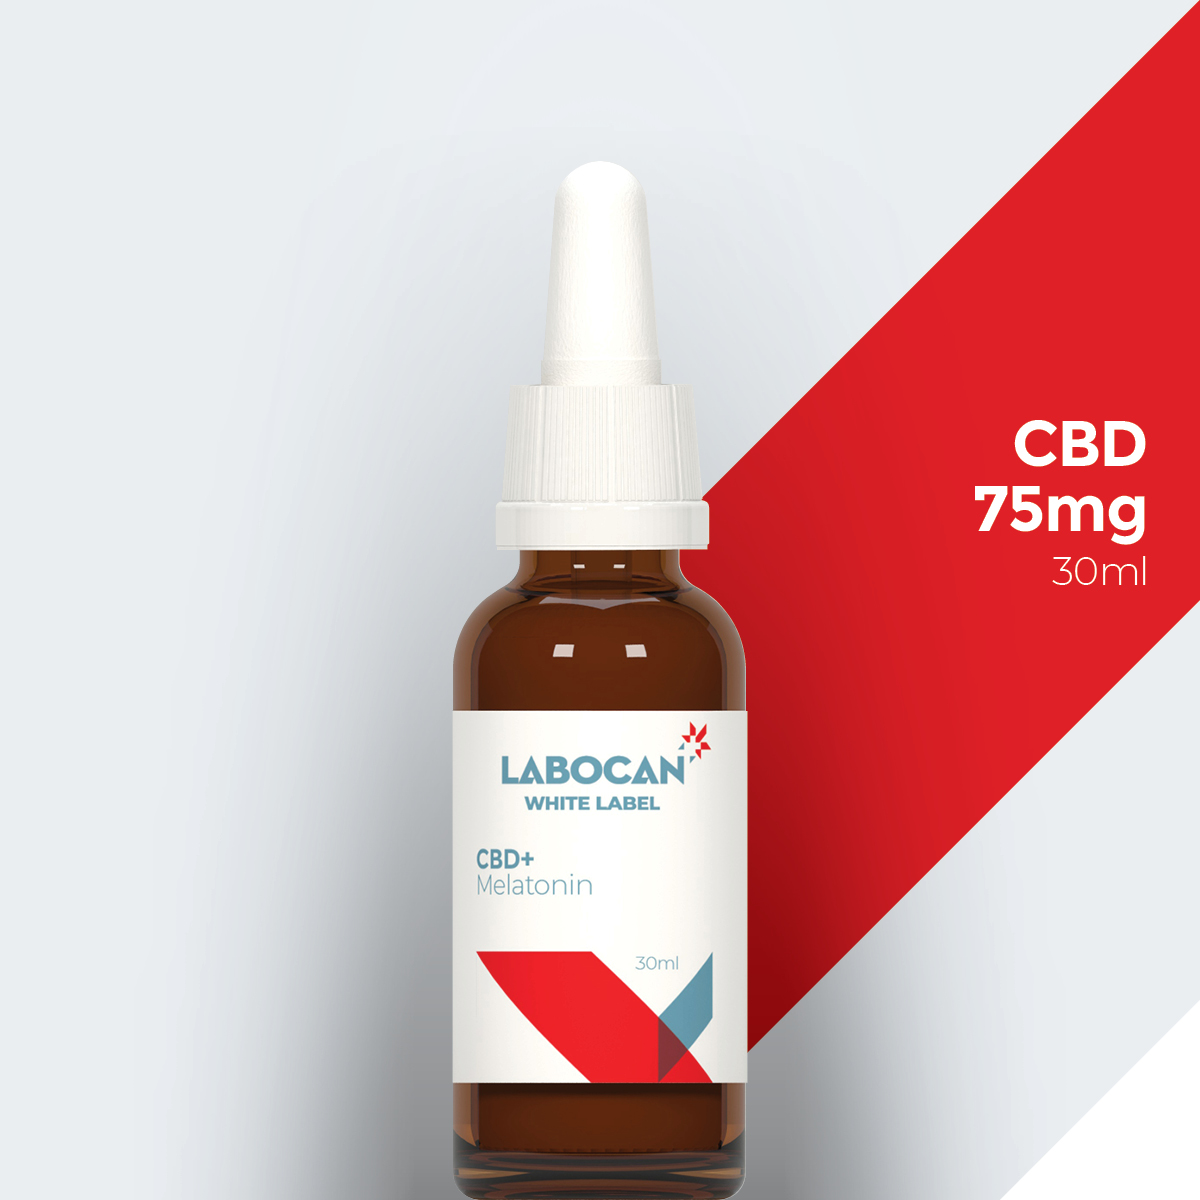 Labocan CBD etichetta bianca con melatonina